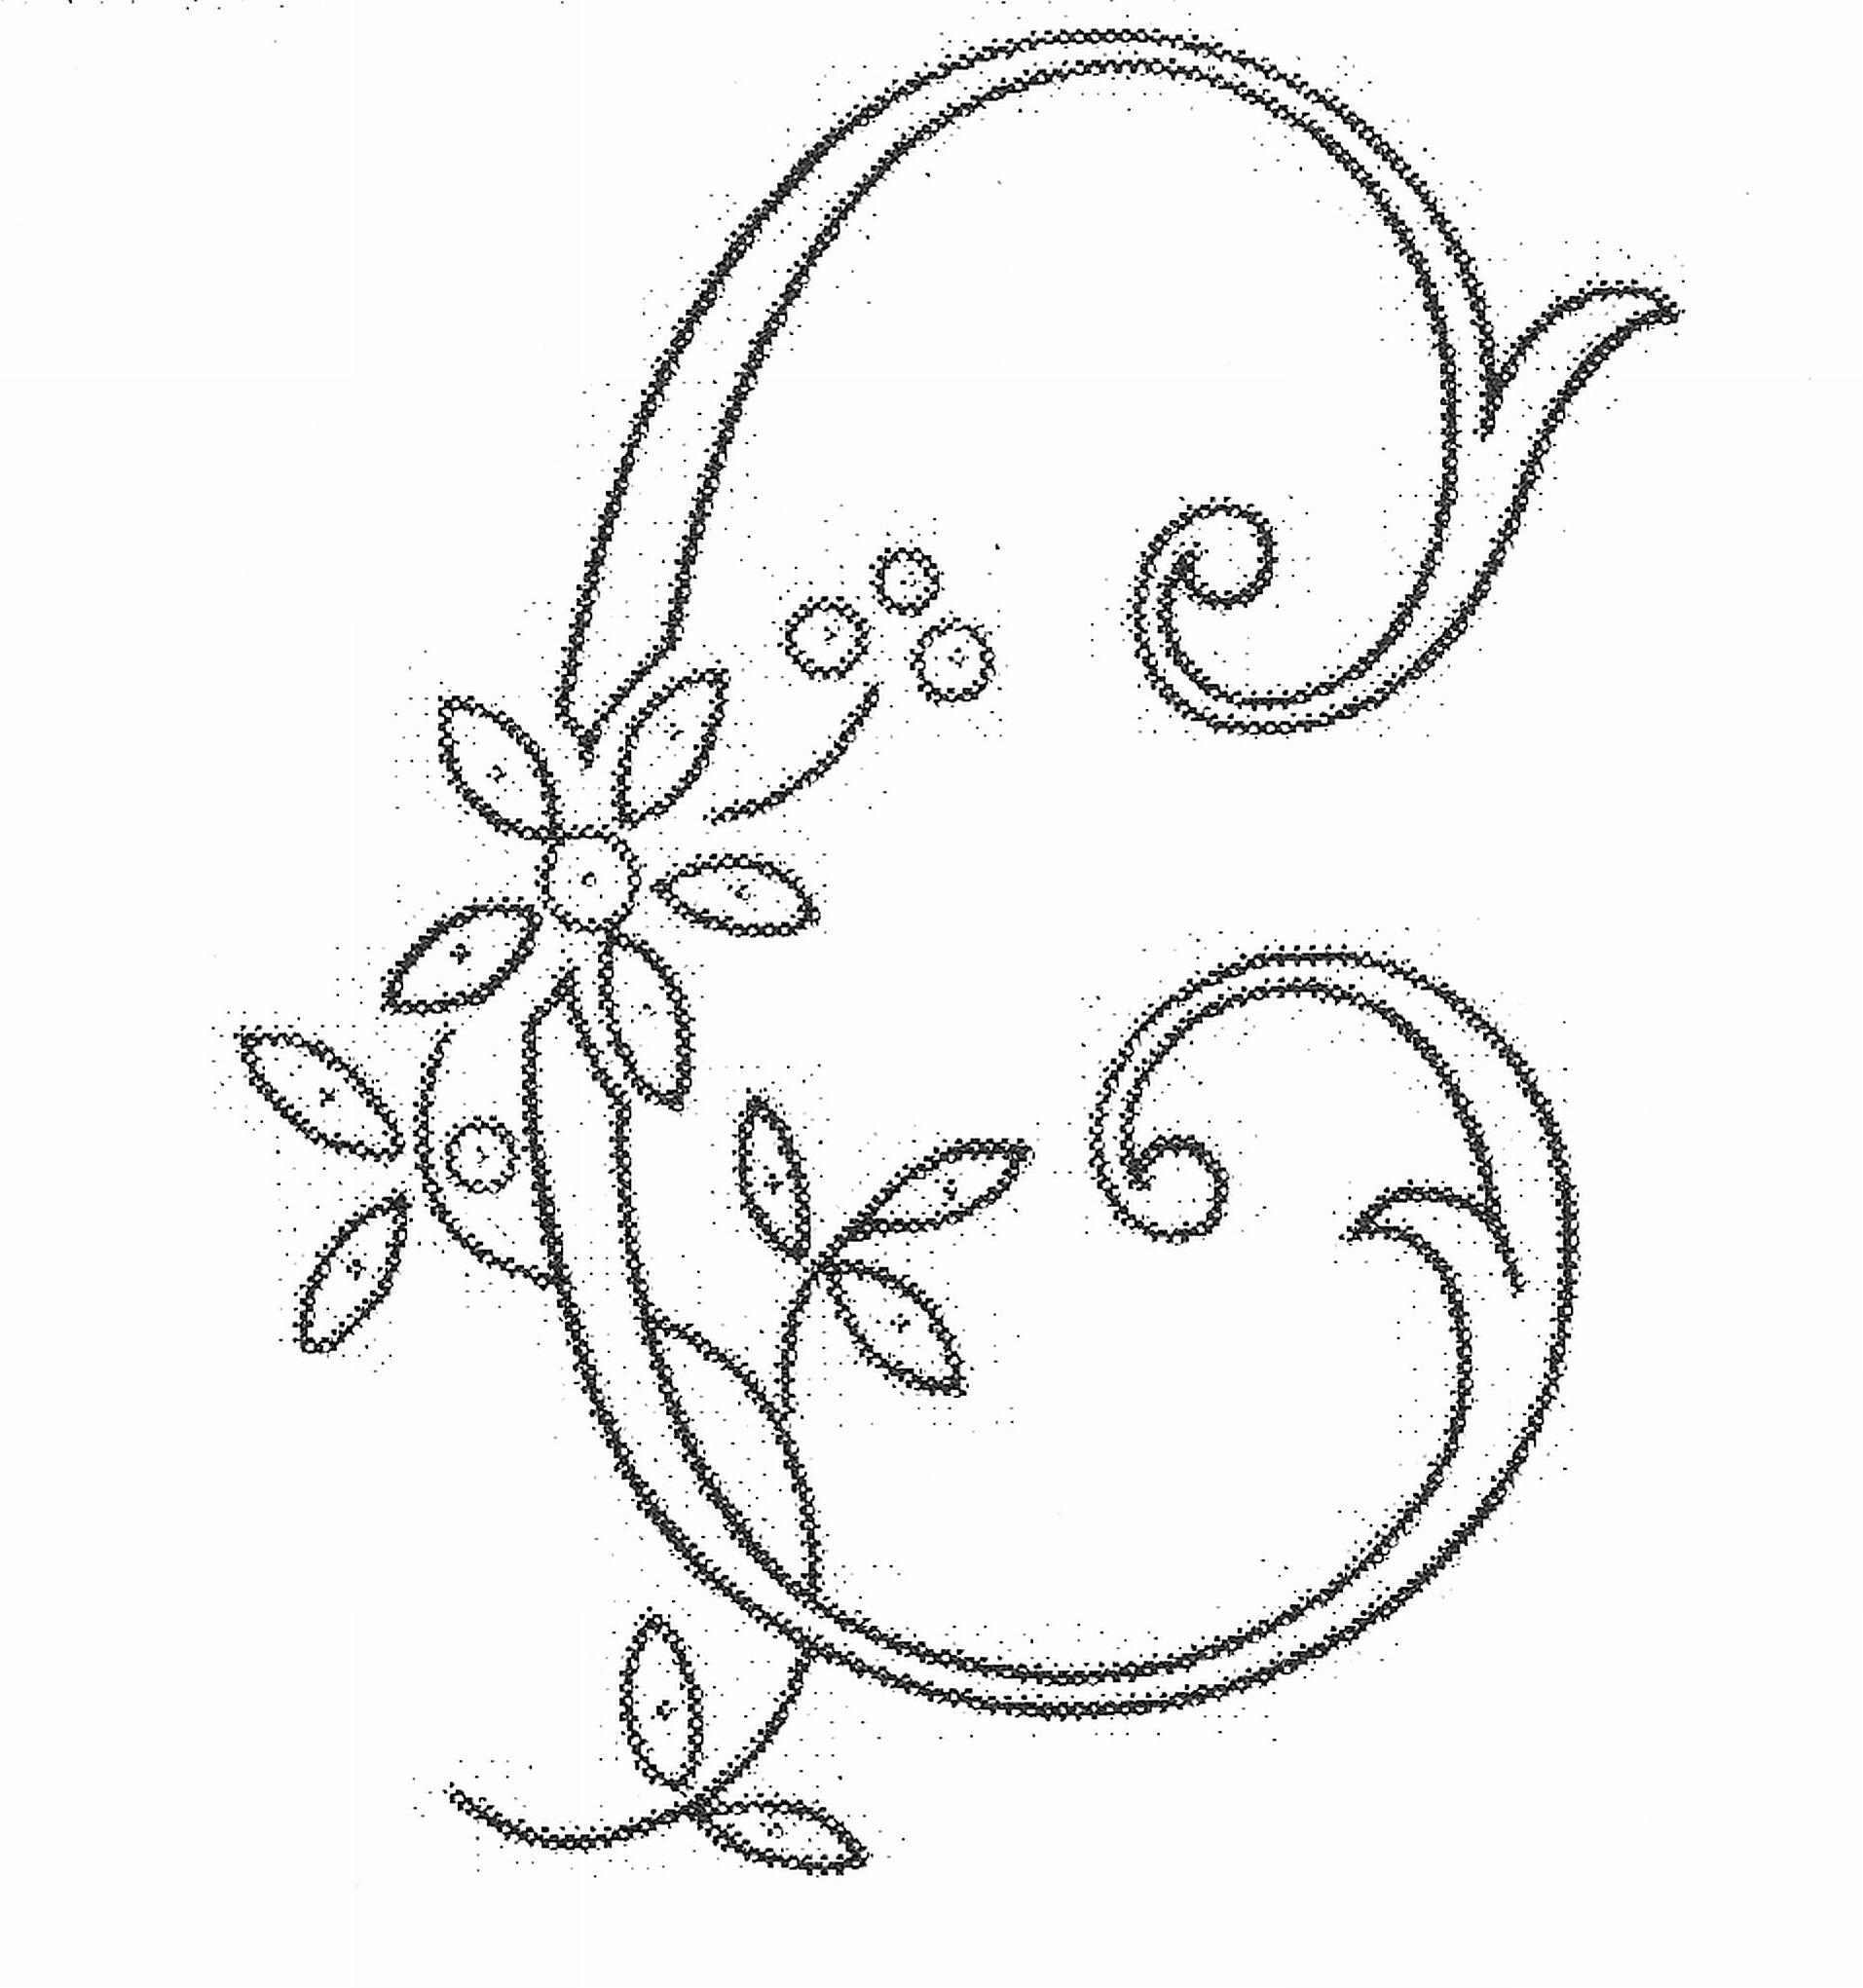 03 04 Monogram Embroidered Letter C